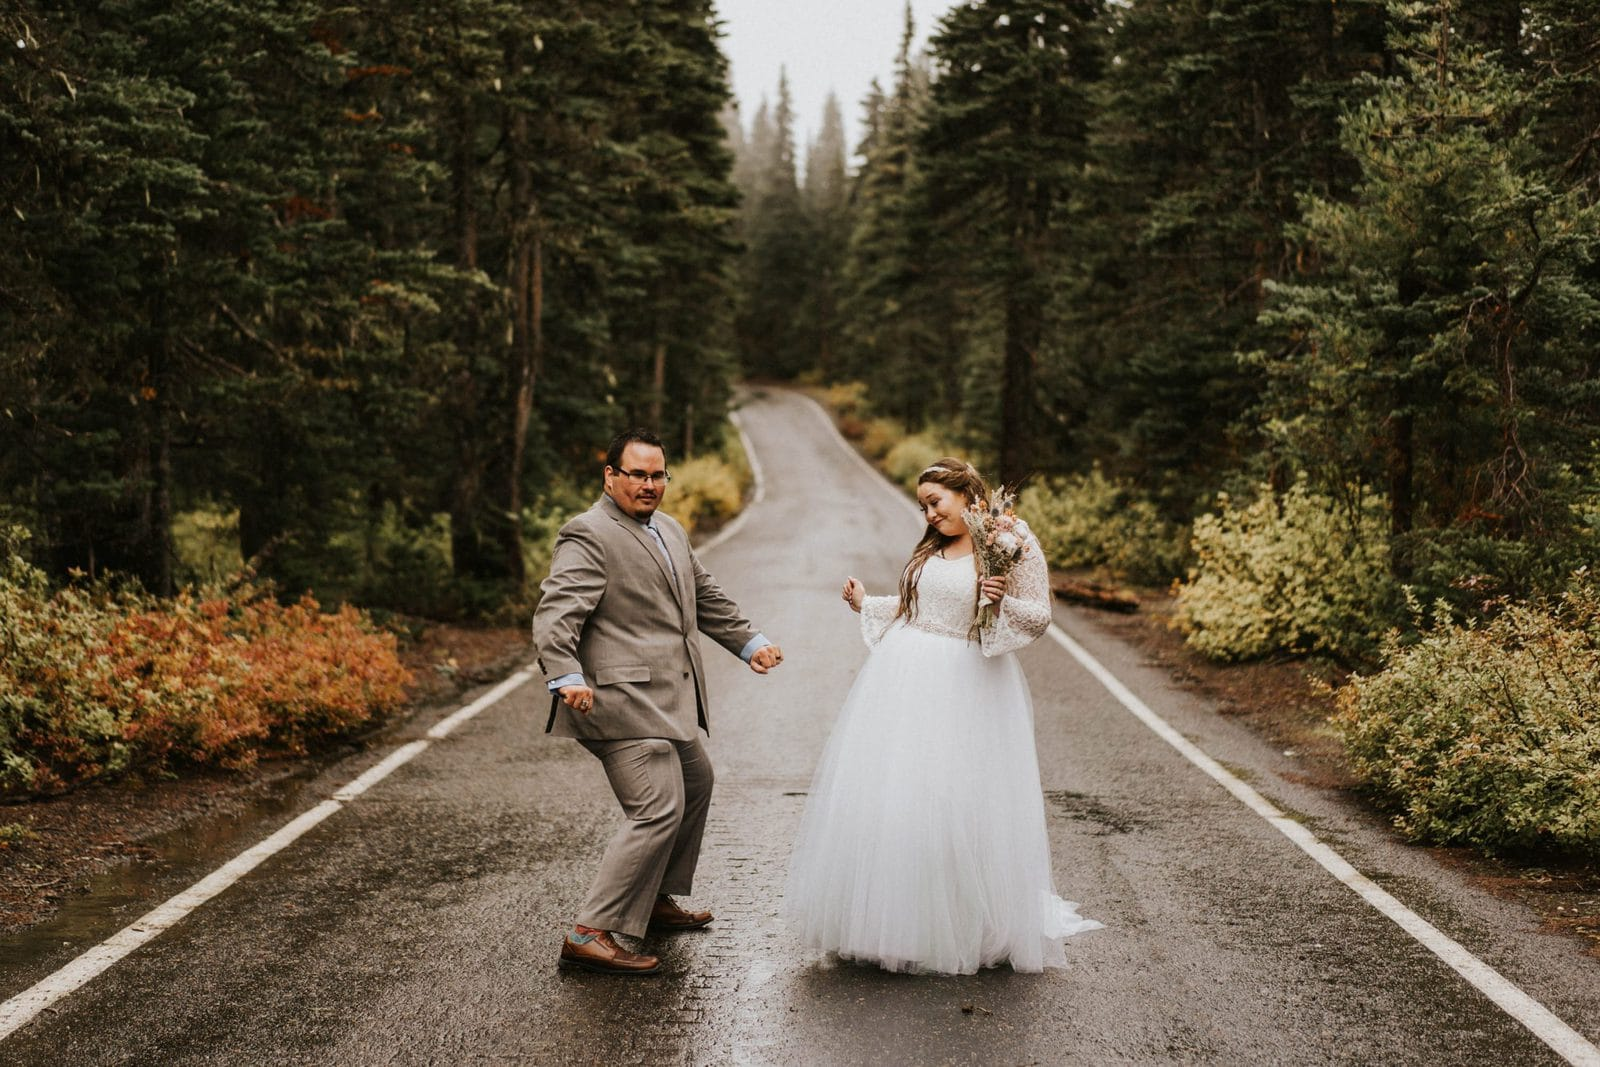 bride and groom dancing in the road